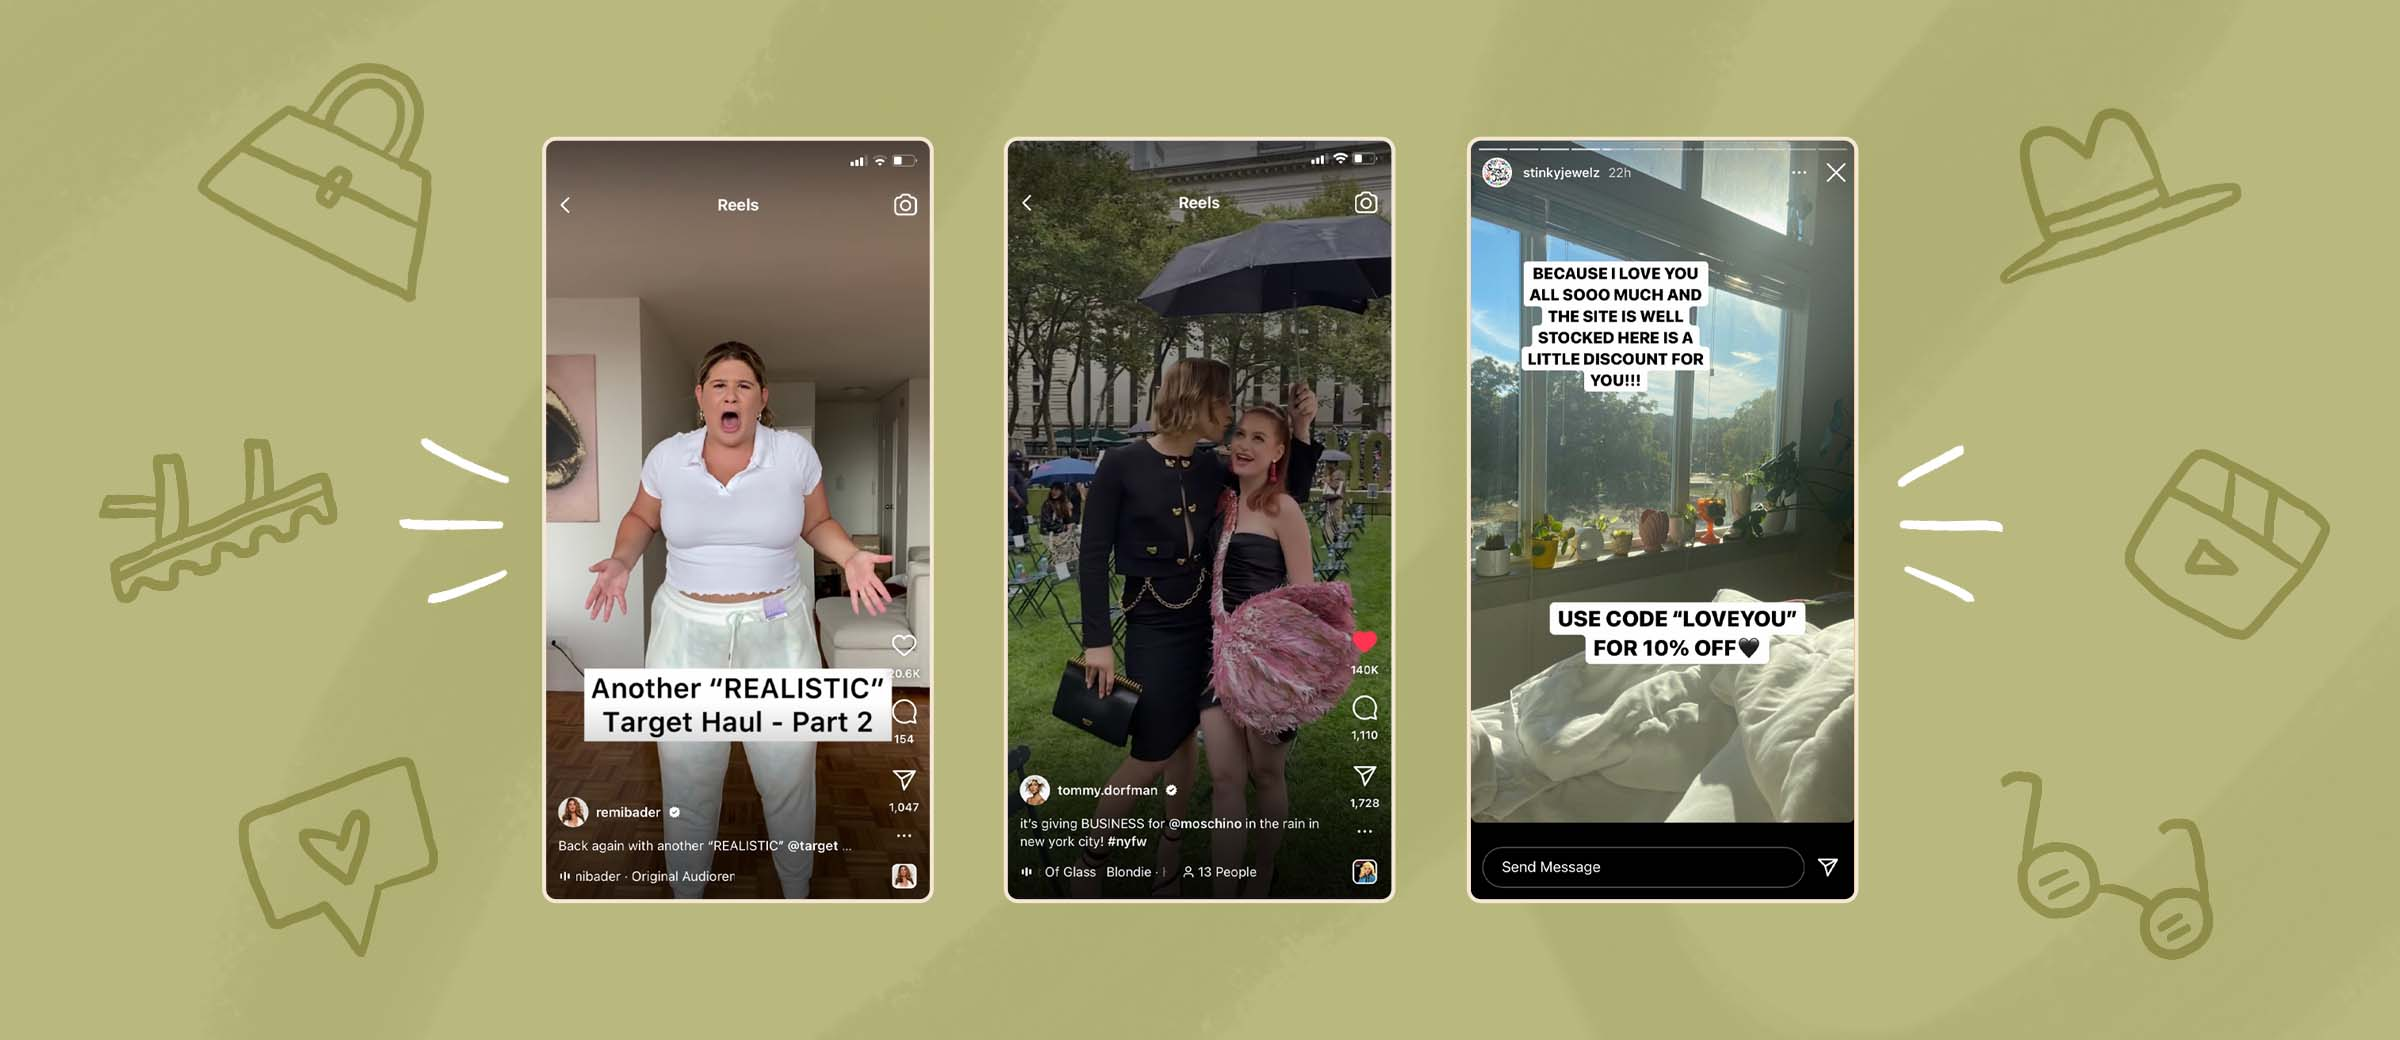 Fashion Marketing: Social Media Tips for Fashion Brands